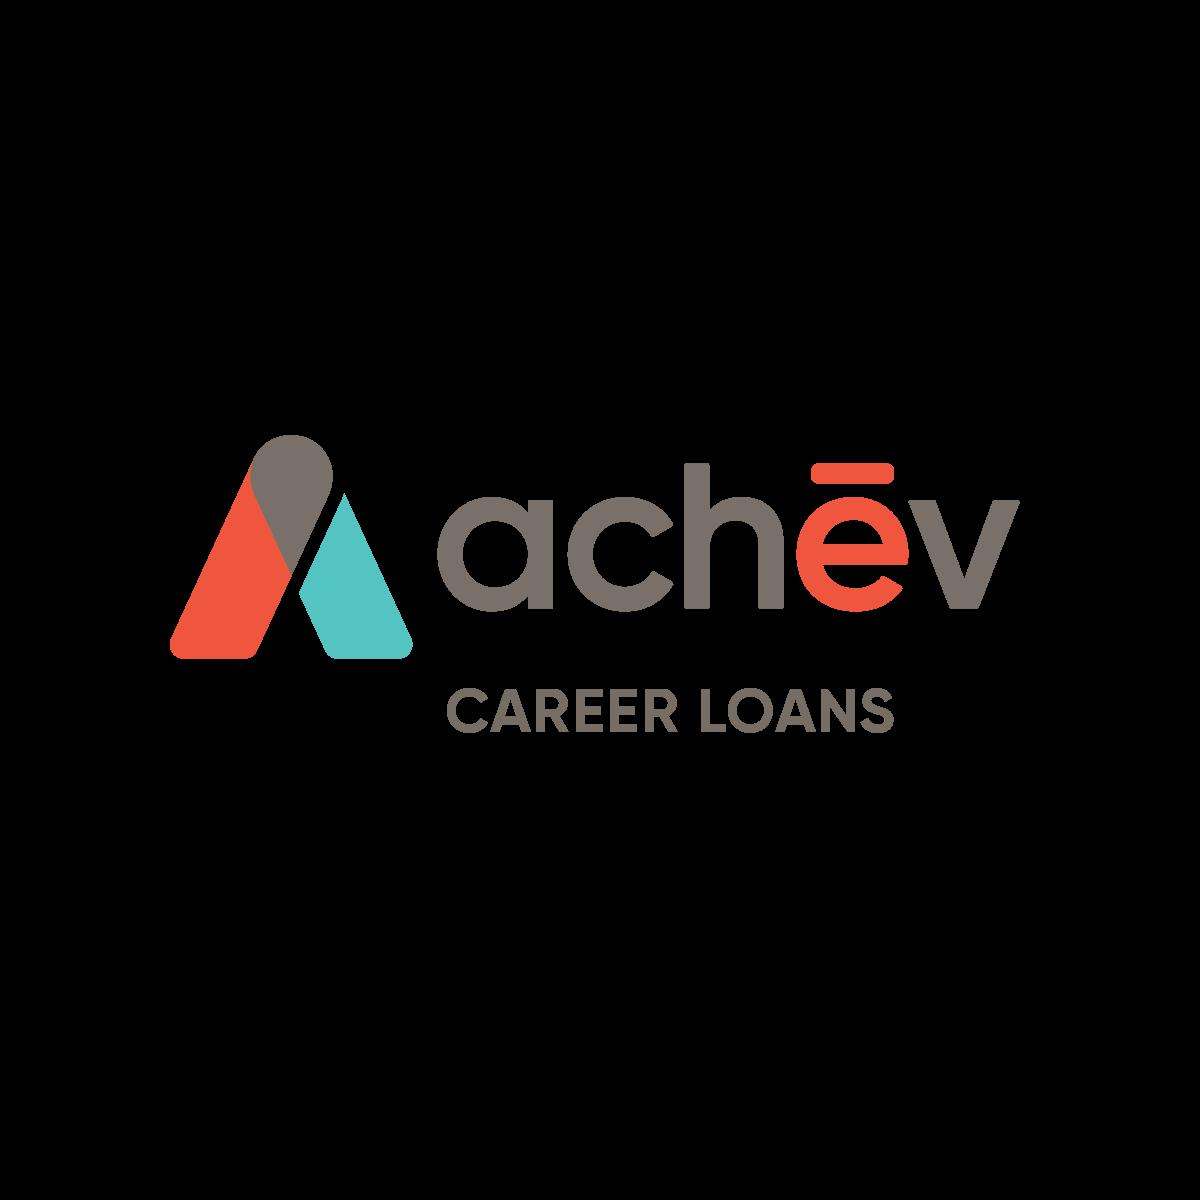 Career Loans